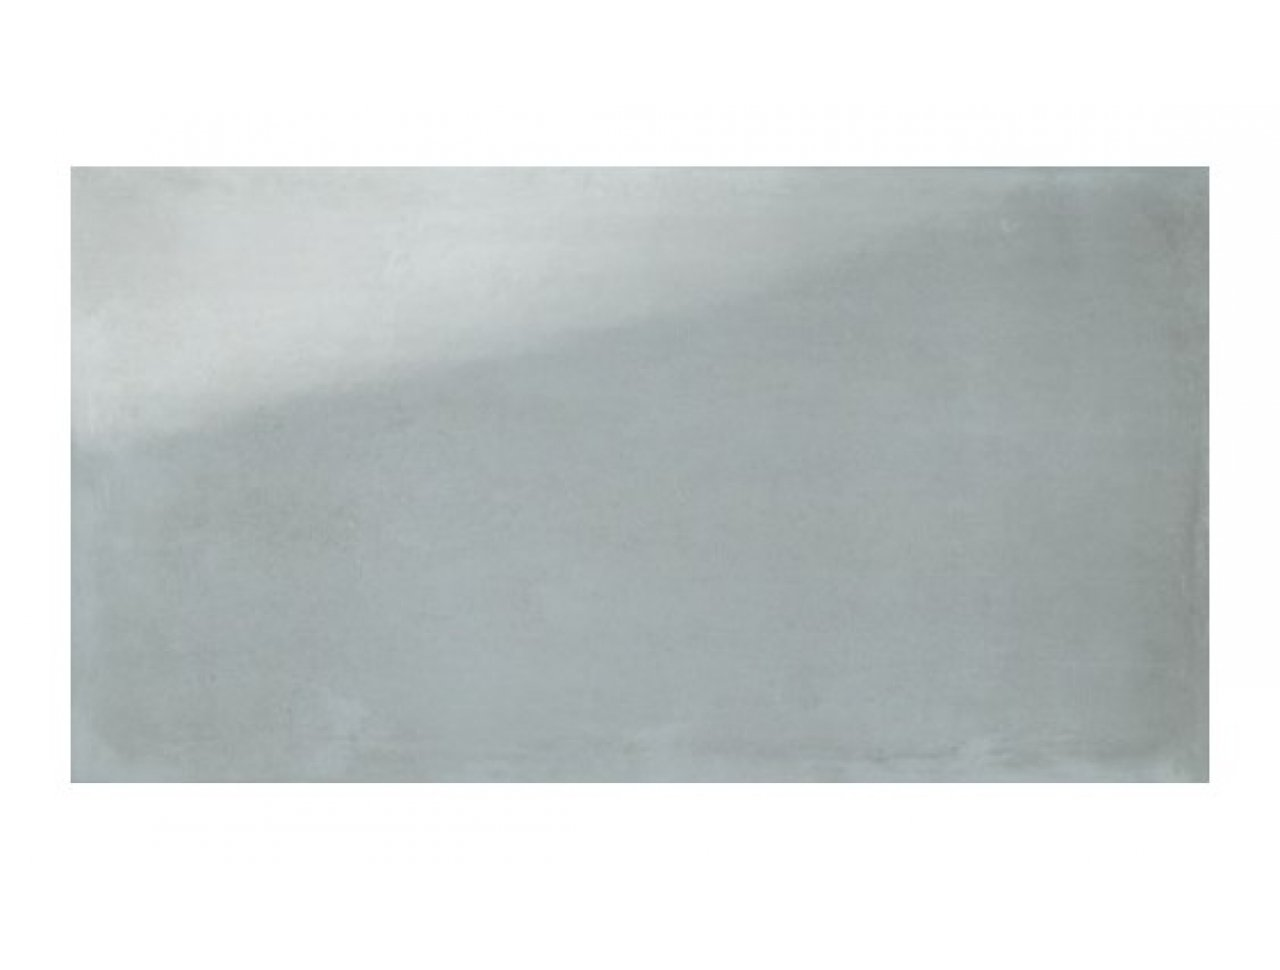 Настенная плитка FAP Frame Sky 30.5 x 56 см, Арт. fLEH